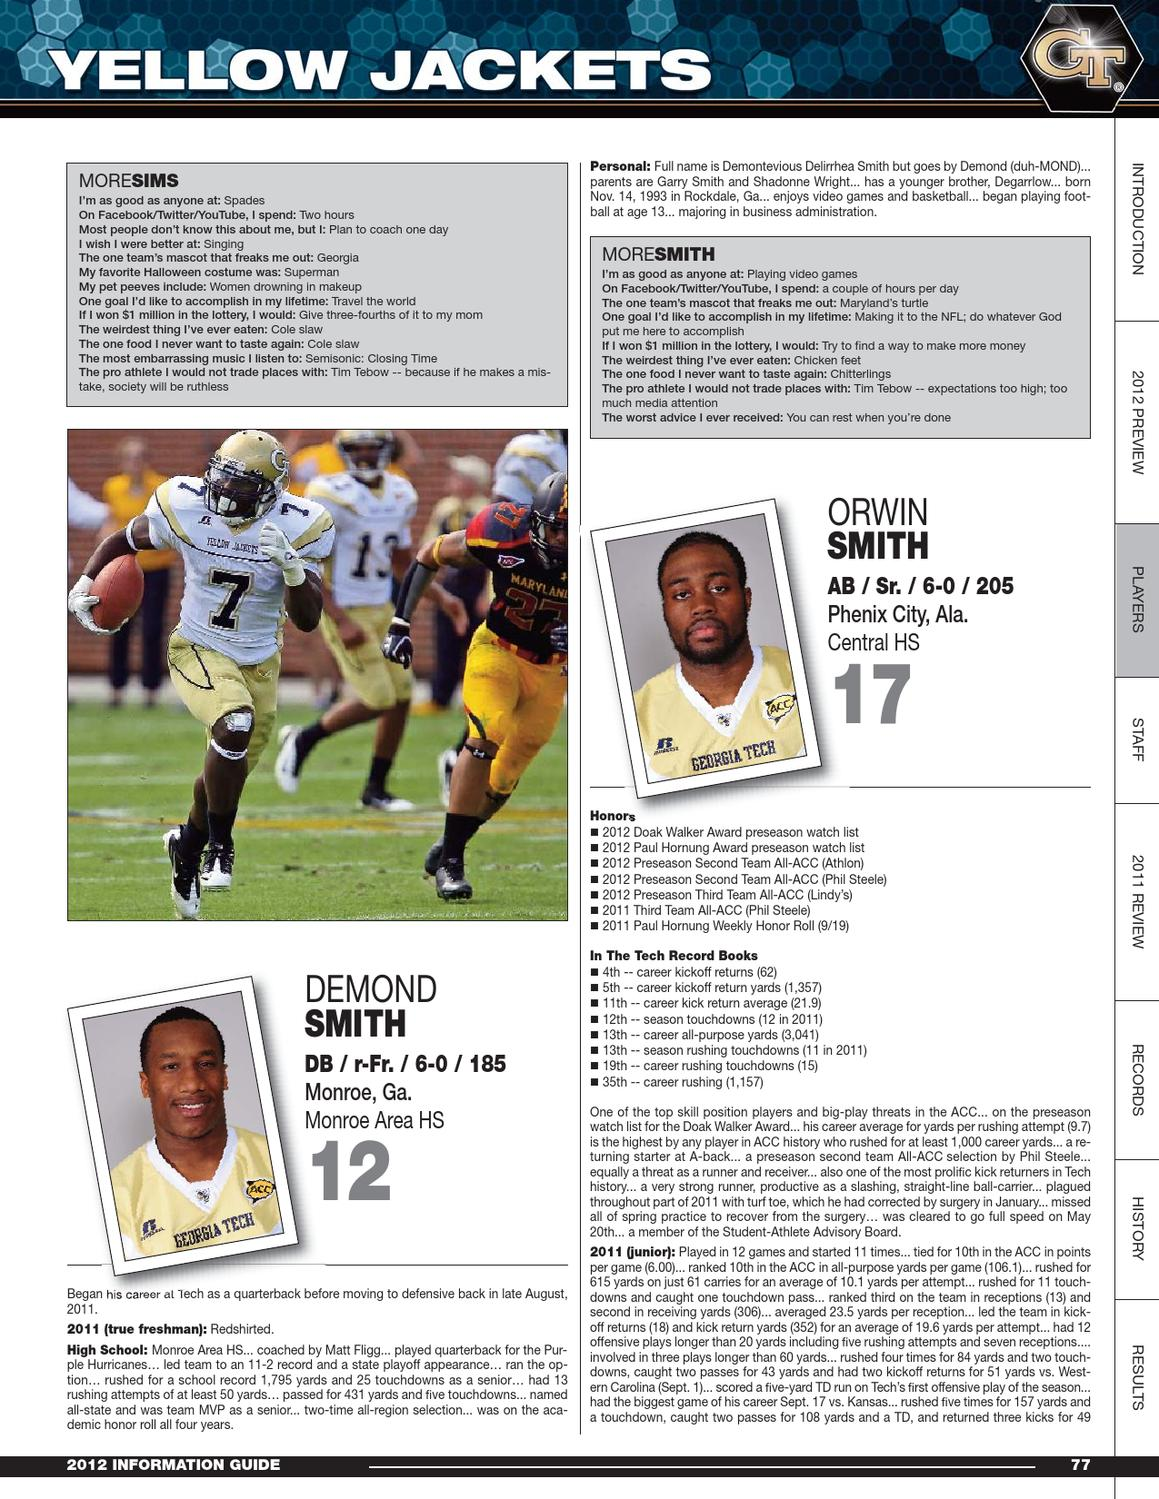 2012 Georgia Tech Football Info Guide by GTAthletics - issuu